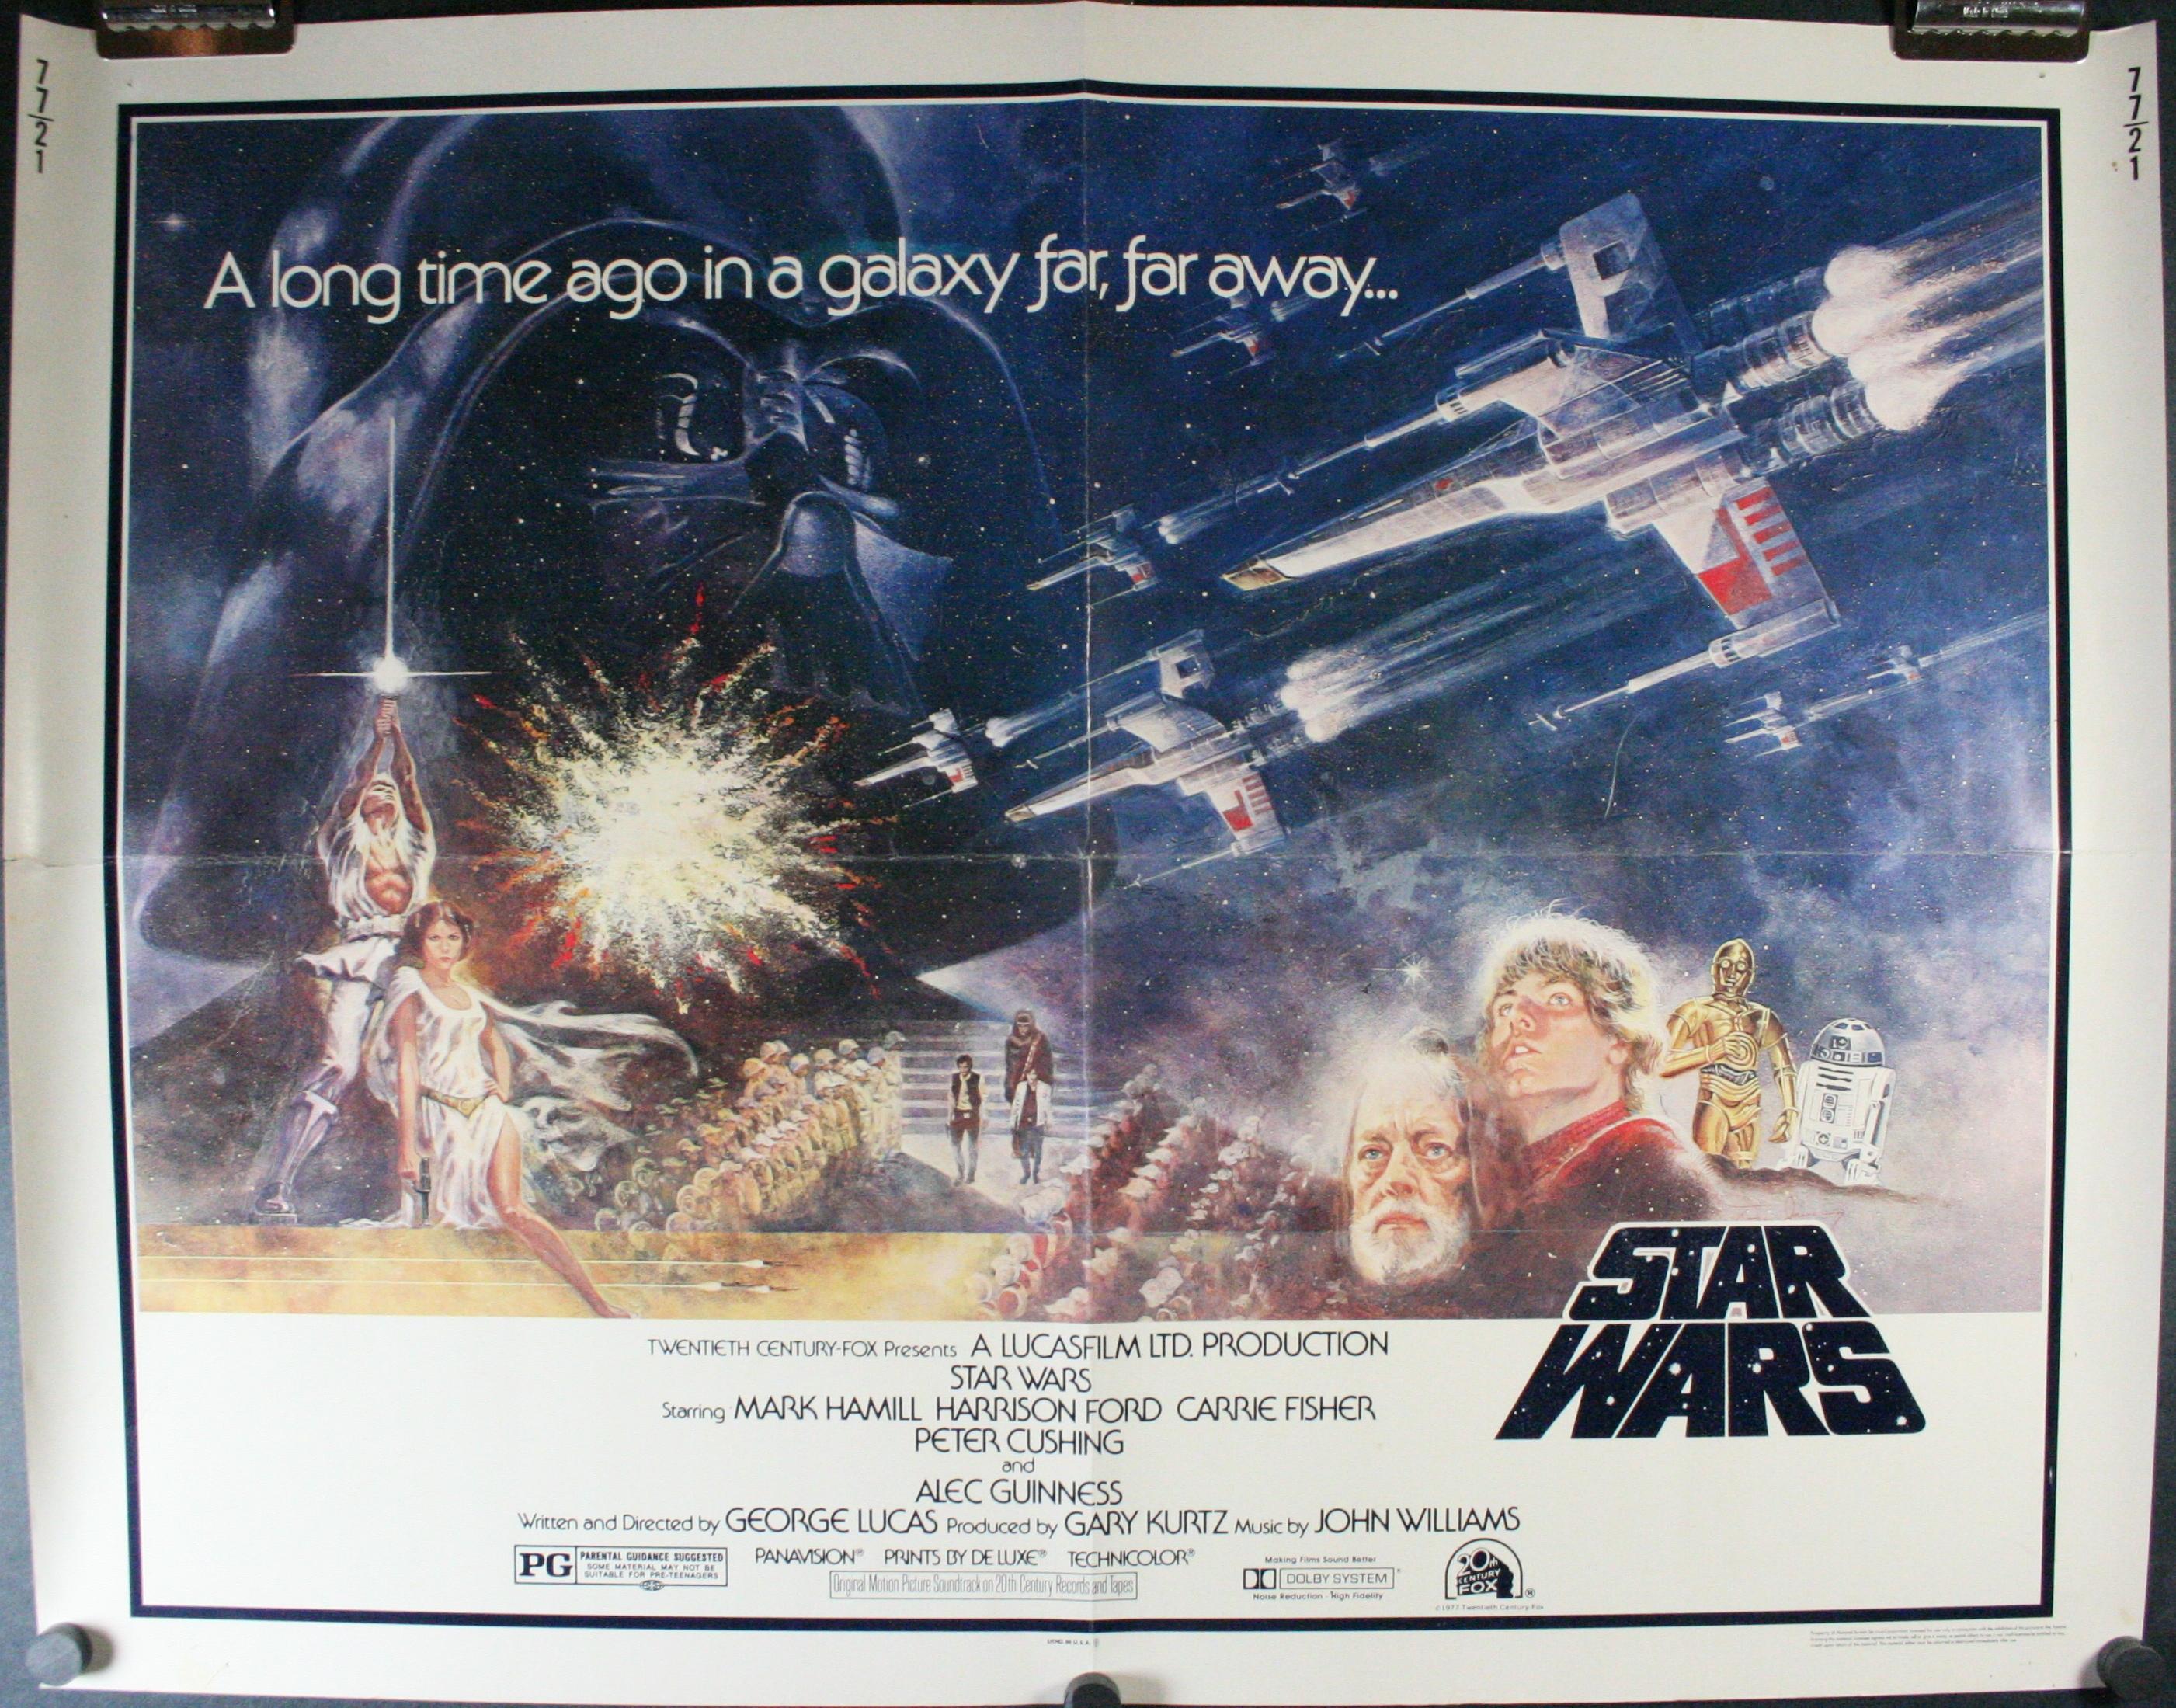 Star Wars Original Pg Ratings Box Half Sheet Theatrical Movie Poster For Sale Original Vintage Movie Posters